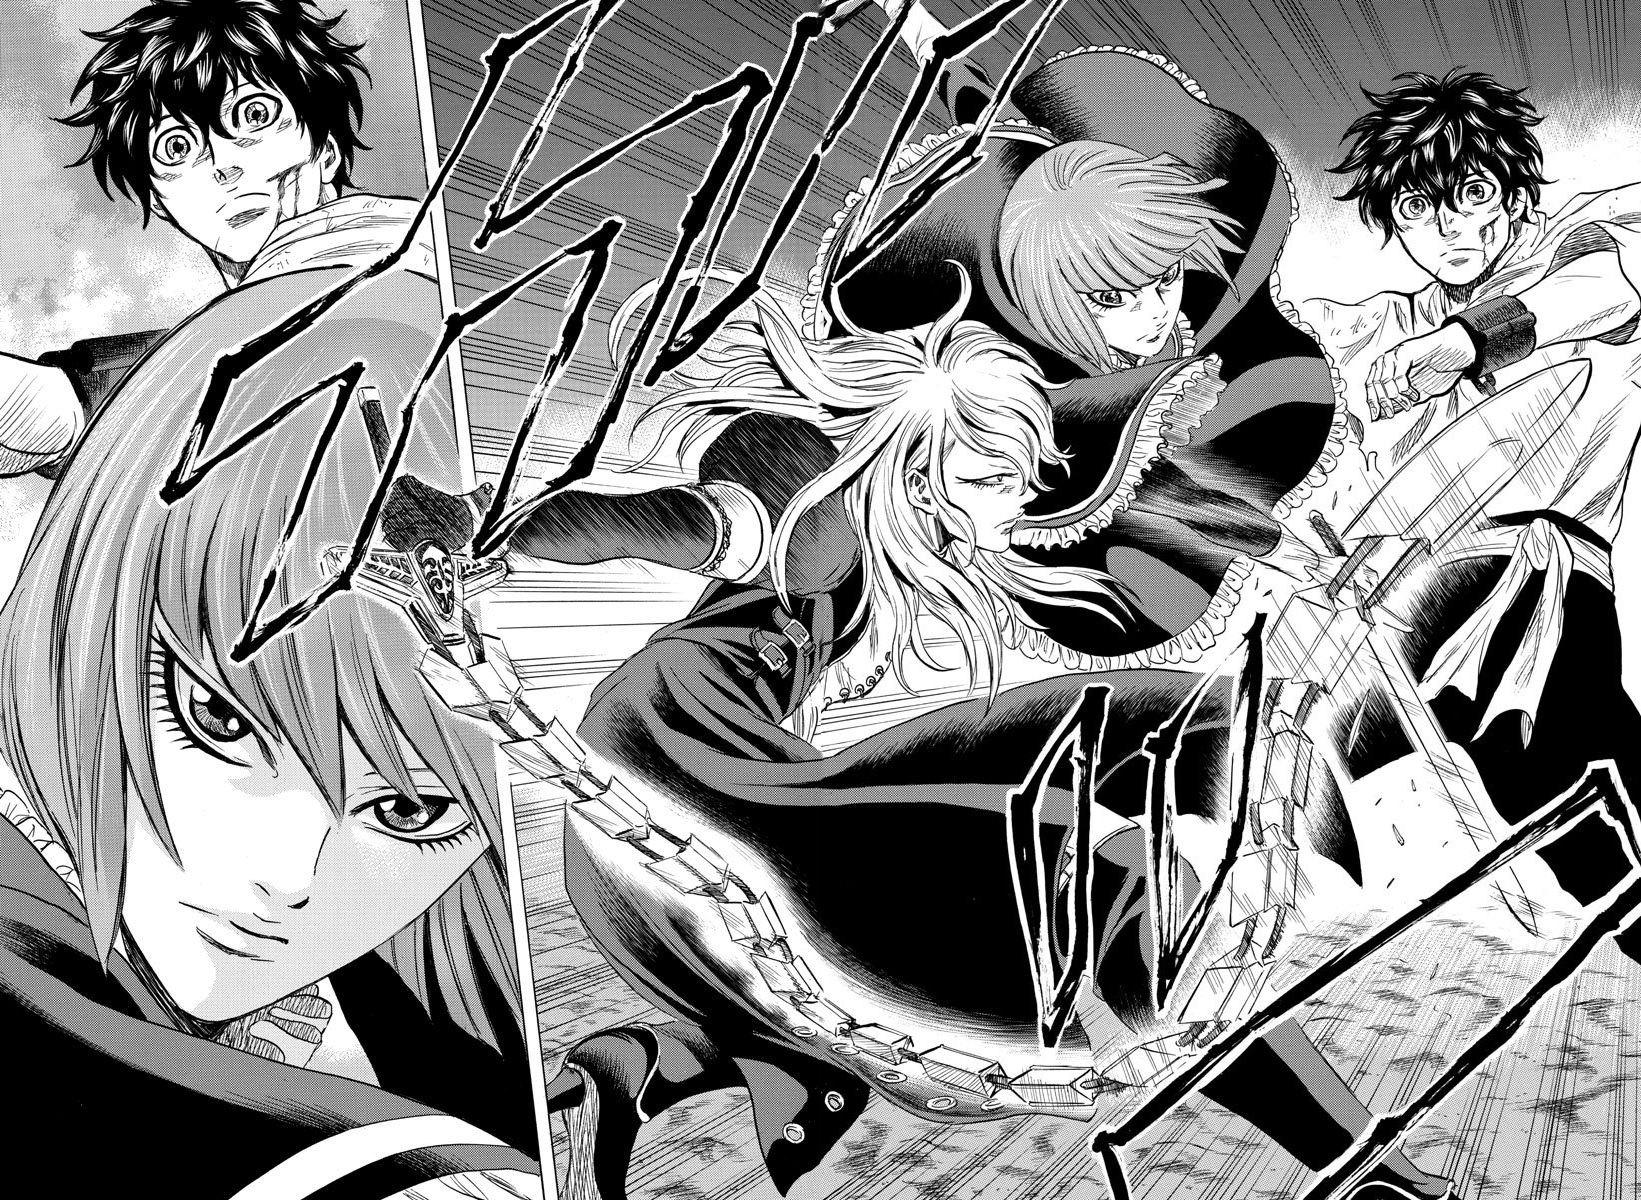 Elio le fugitif de Masami Hosokawa, double page